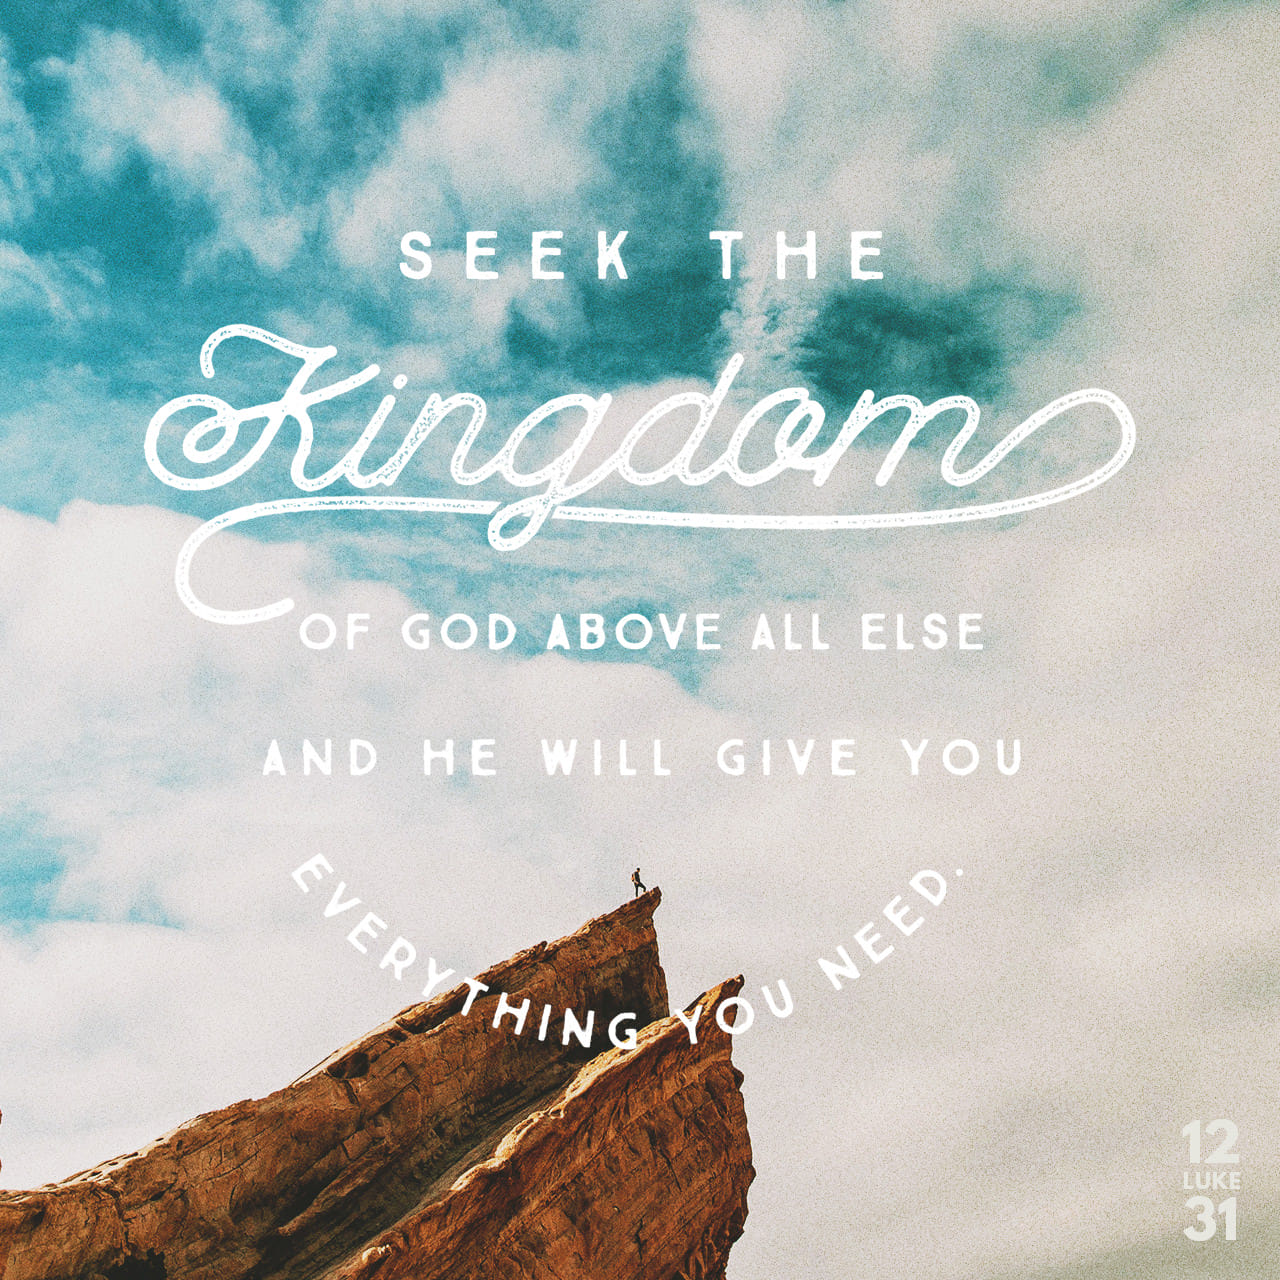 Luke 12:31 Seek the Kingdom of God above all else, and he